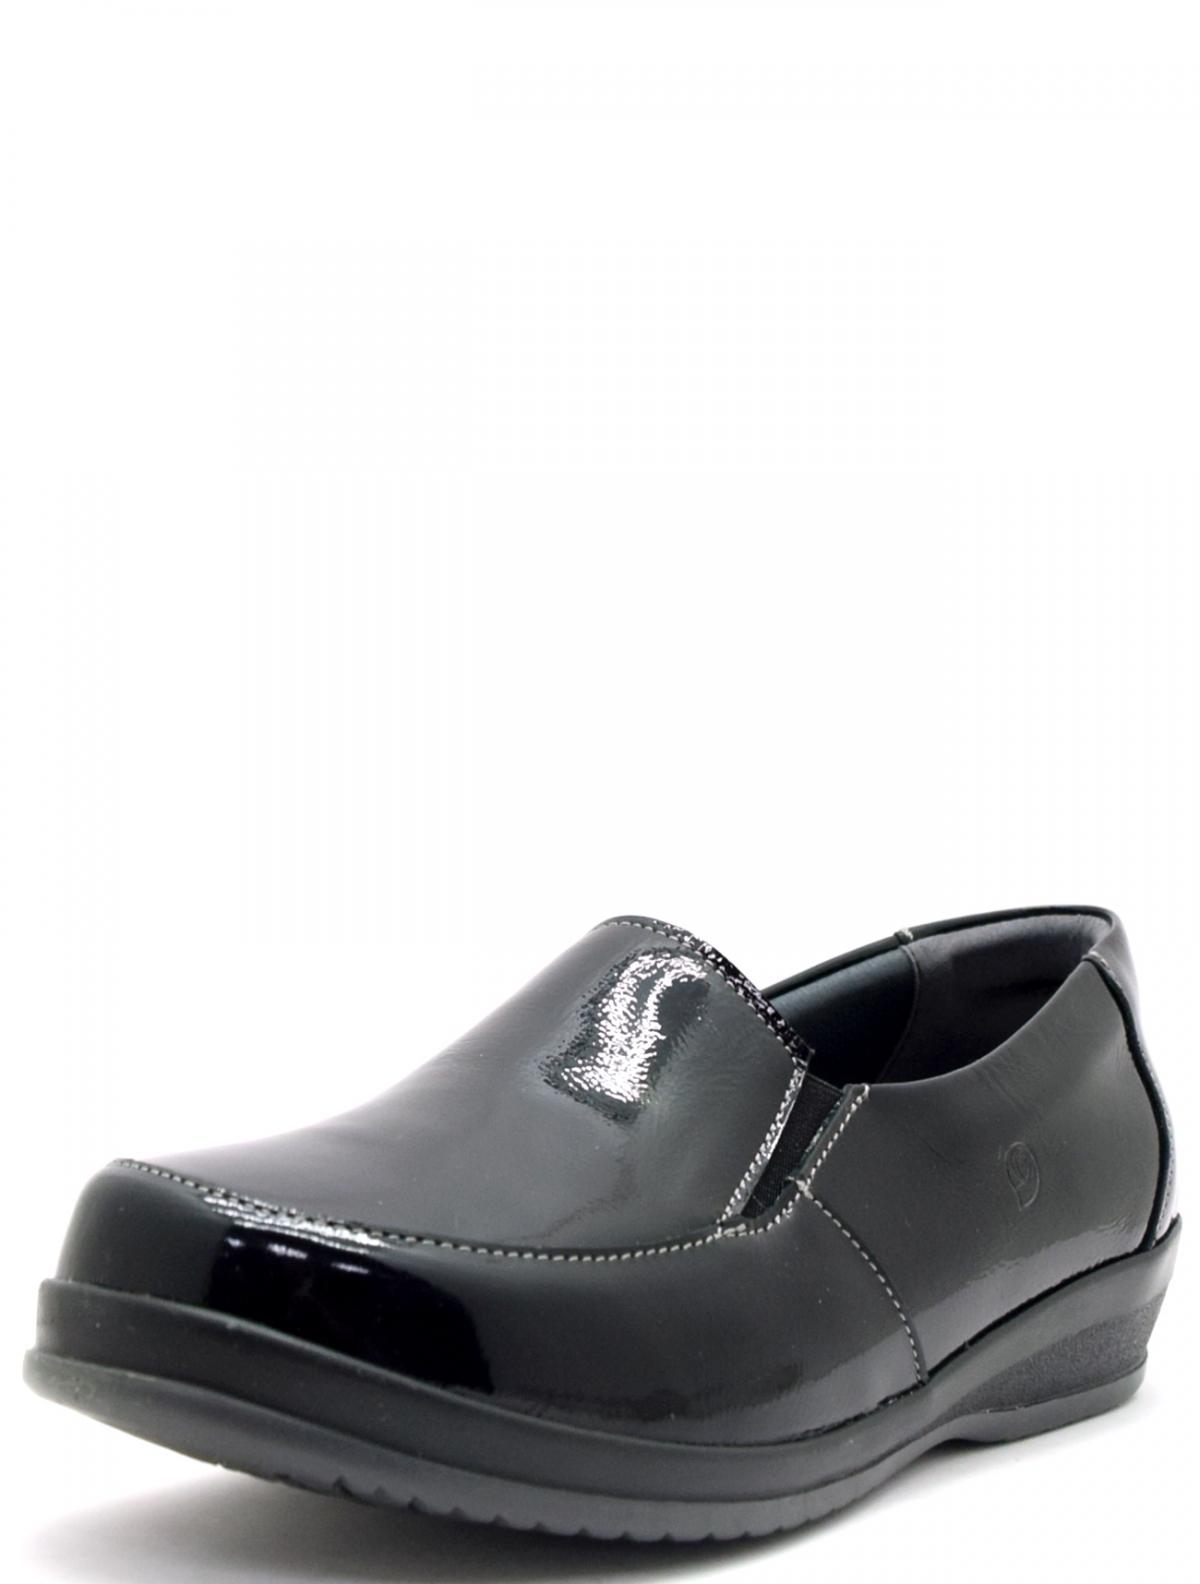 Suave 4635 женские туфли